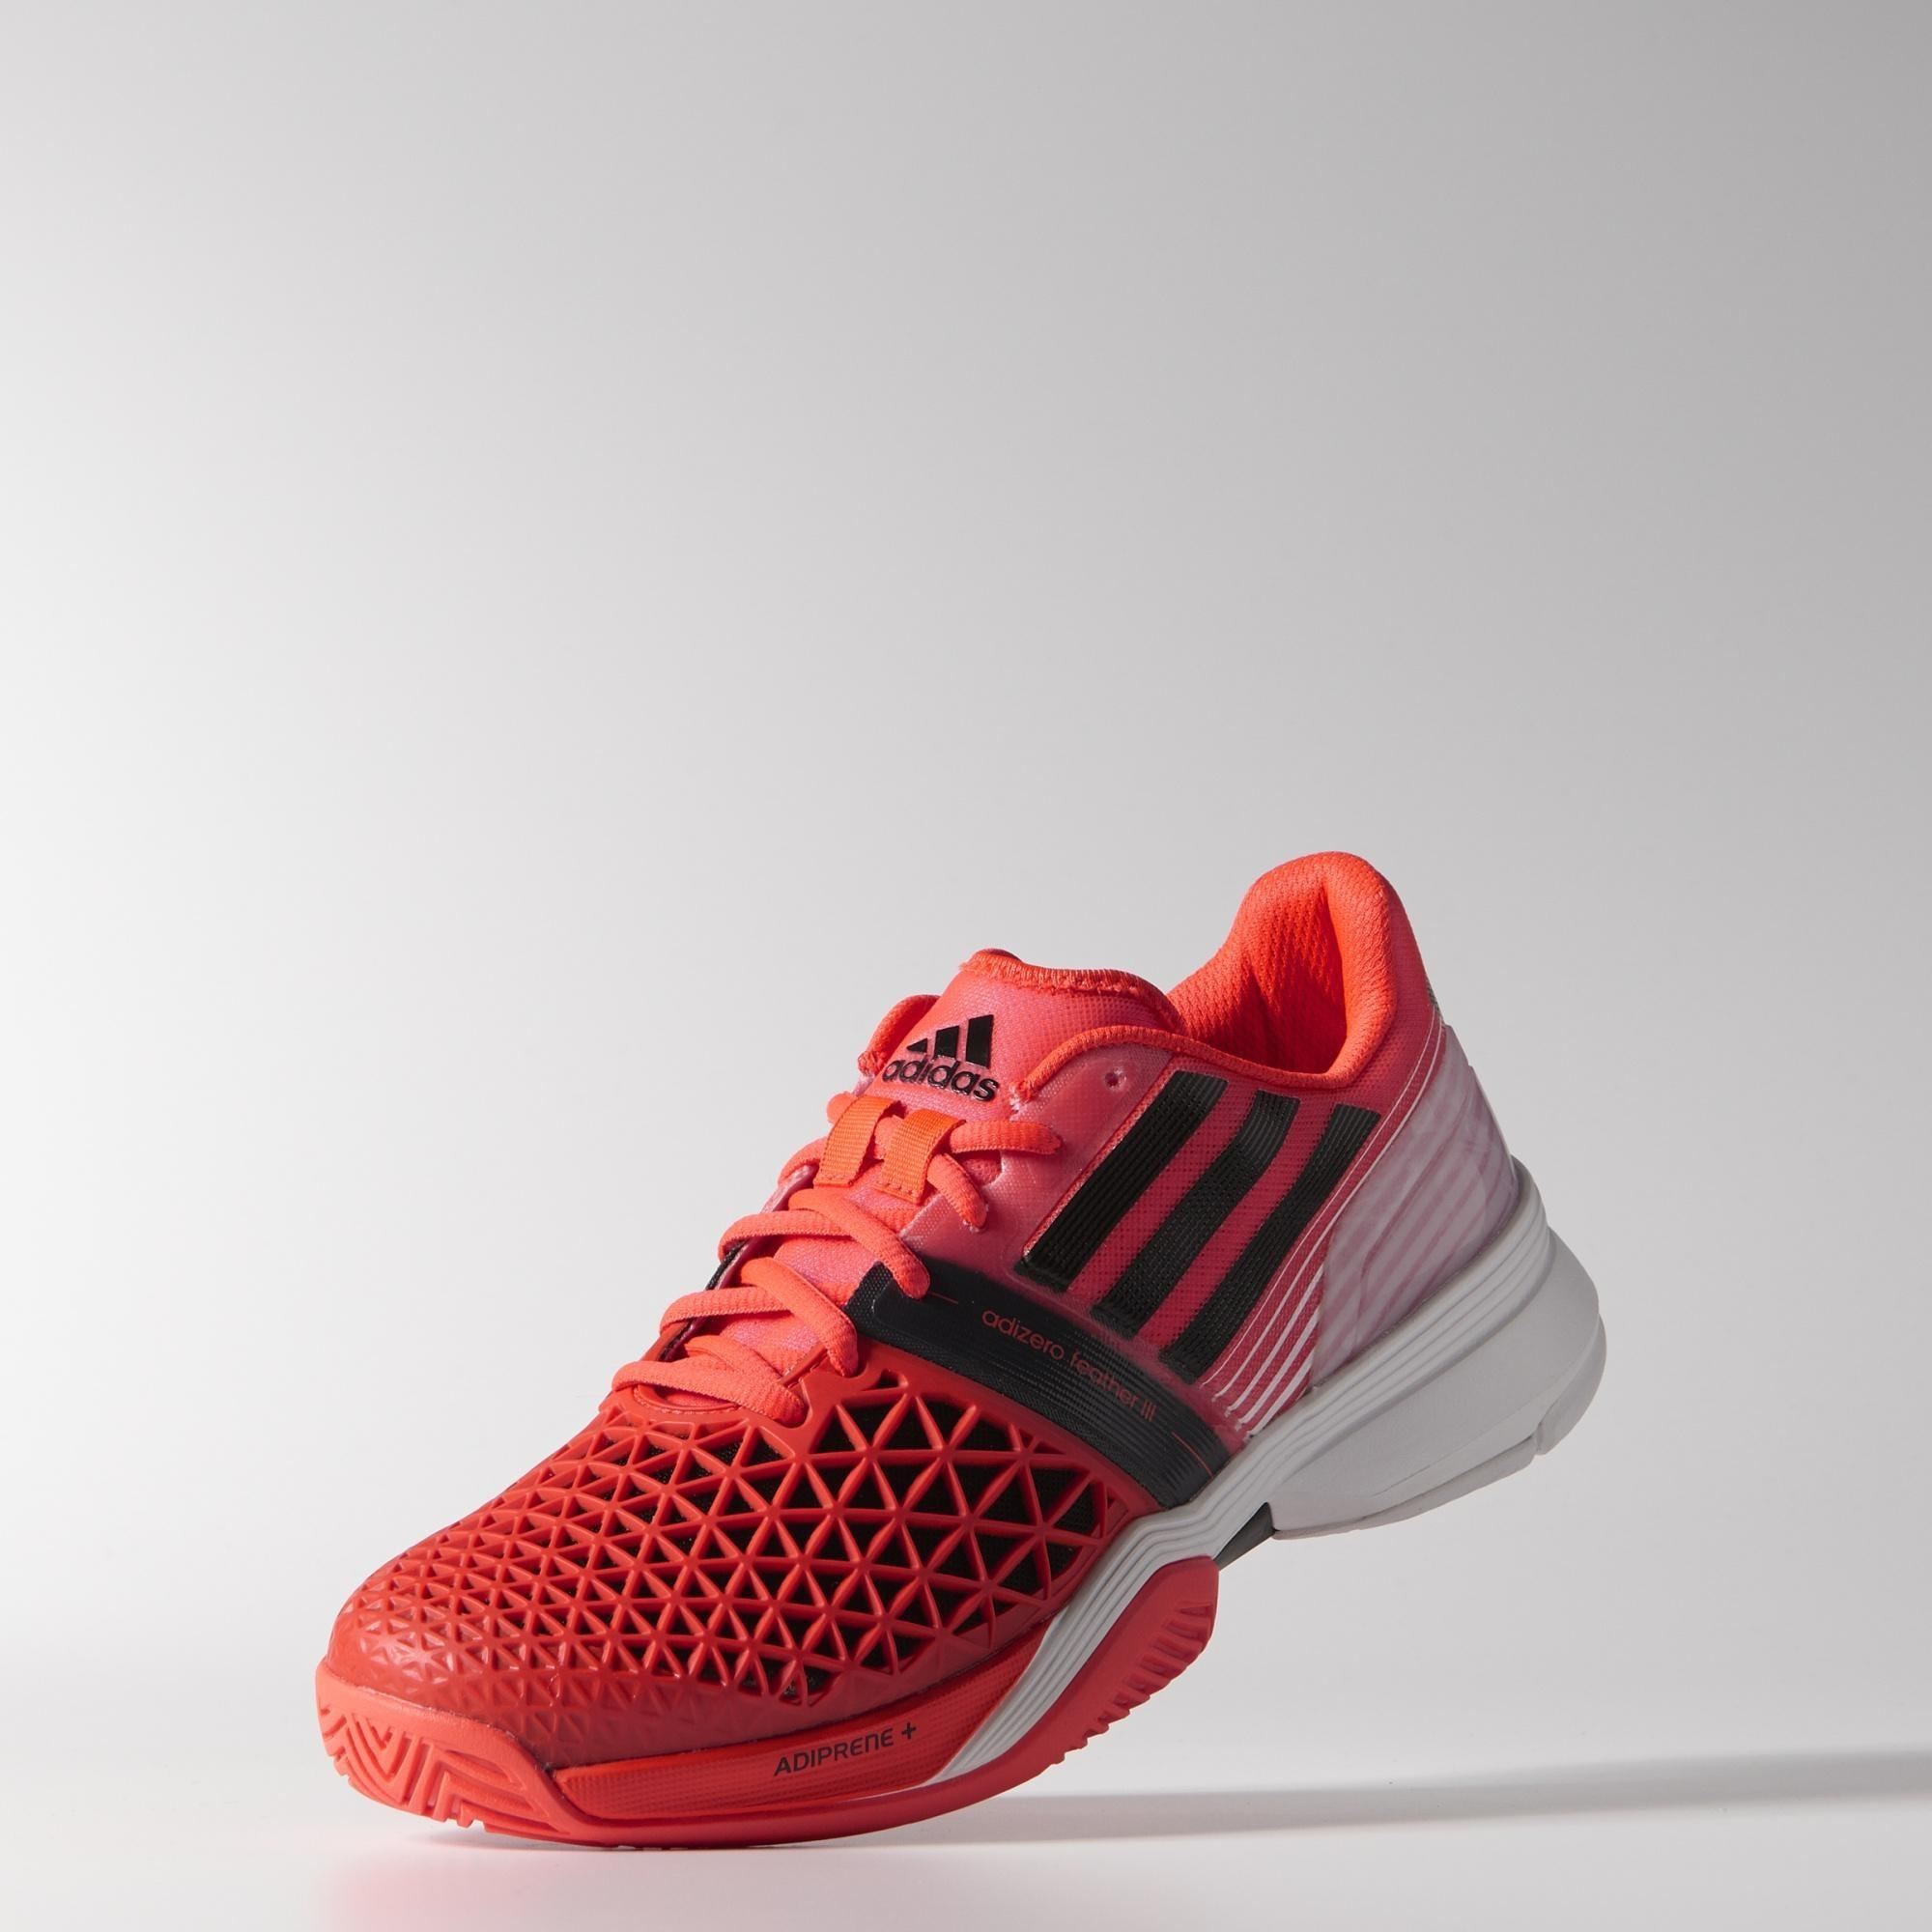 best service 9dd28 d91c6 Adidas Mens CC Adizero Feather III Tennis Shoes - Solar Red